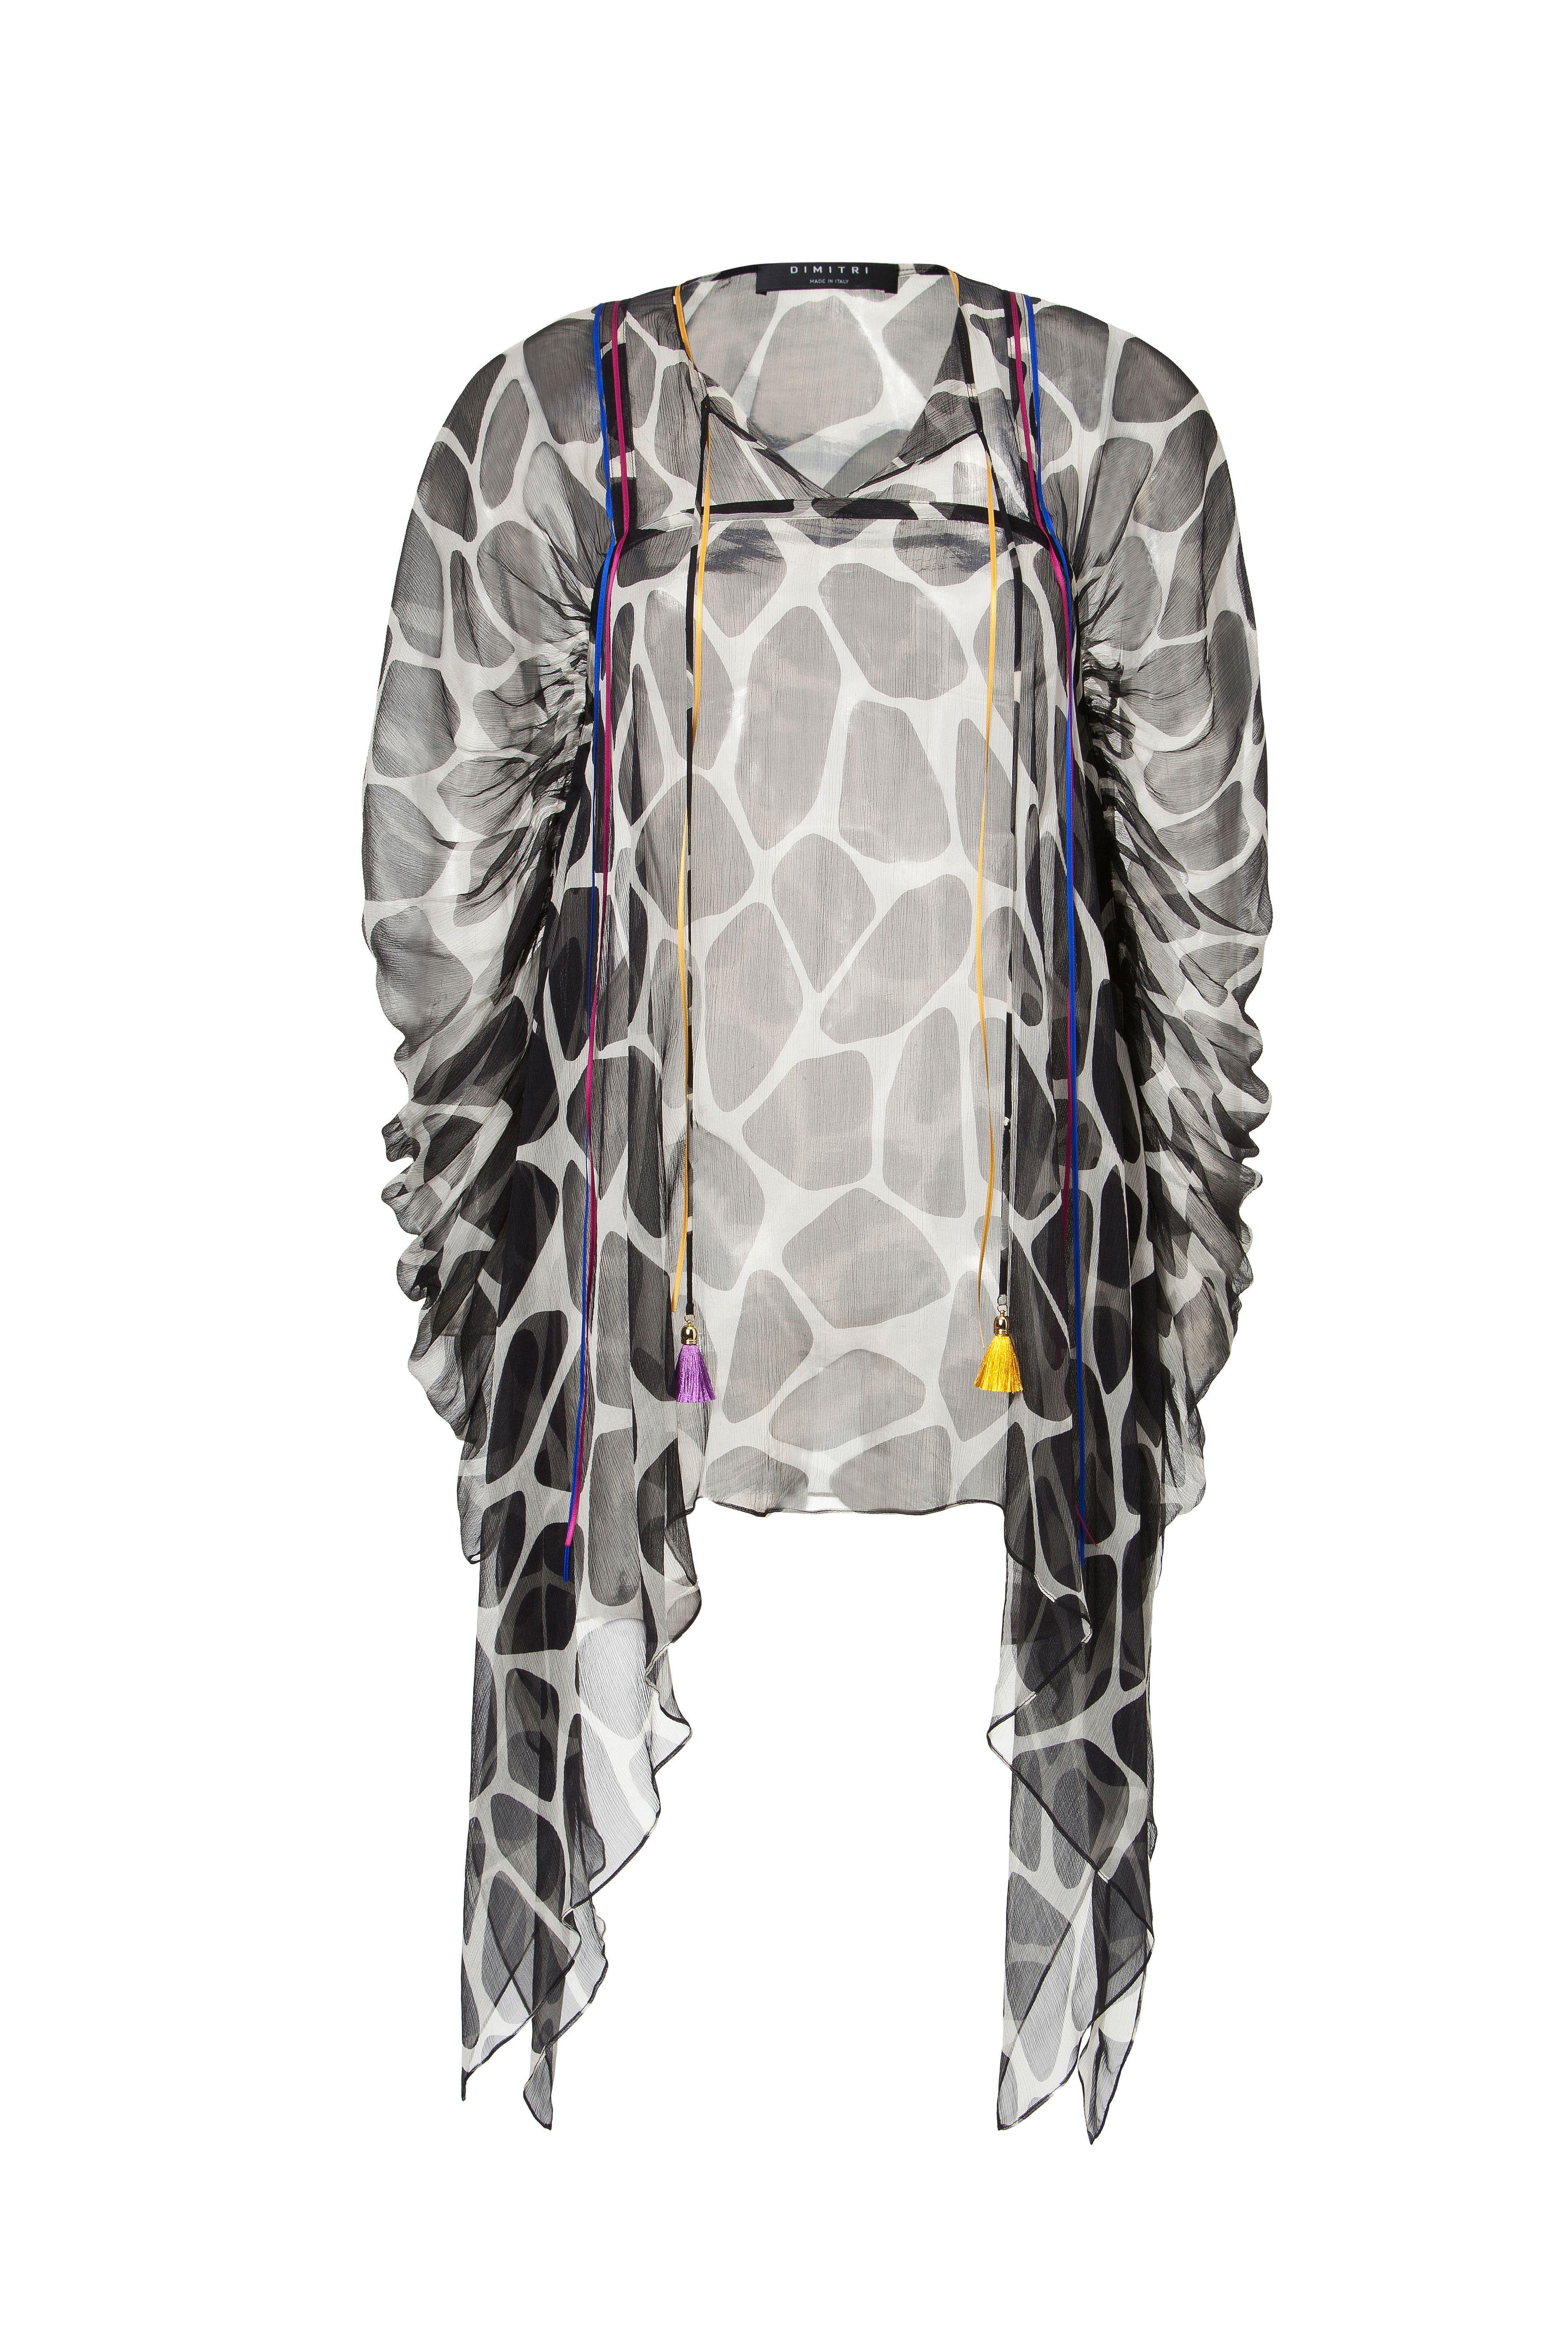 gaia tunic top by Dimitri #dimitri #top #fashion #madeinitaly